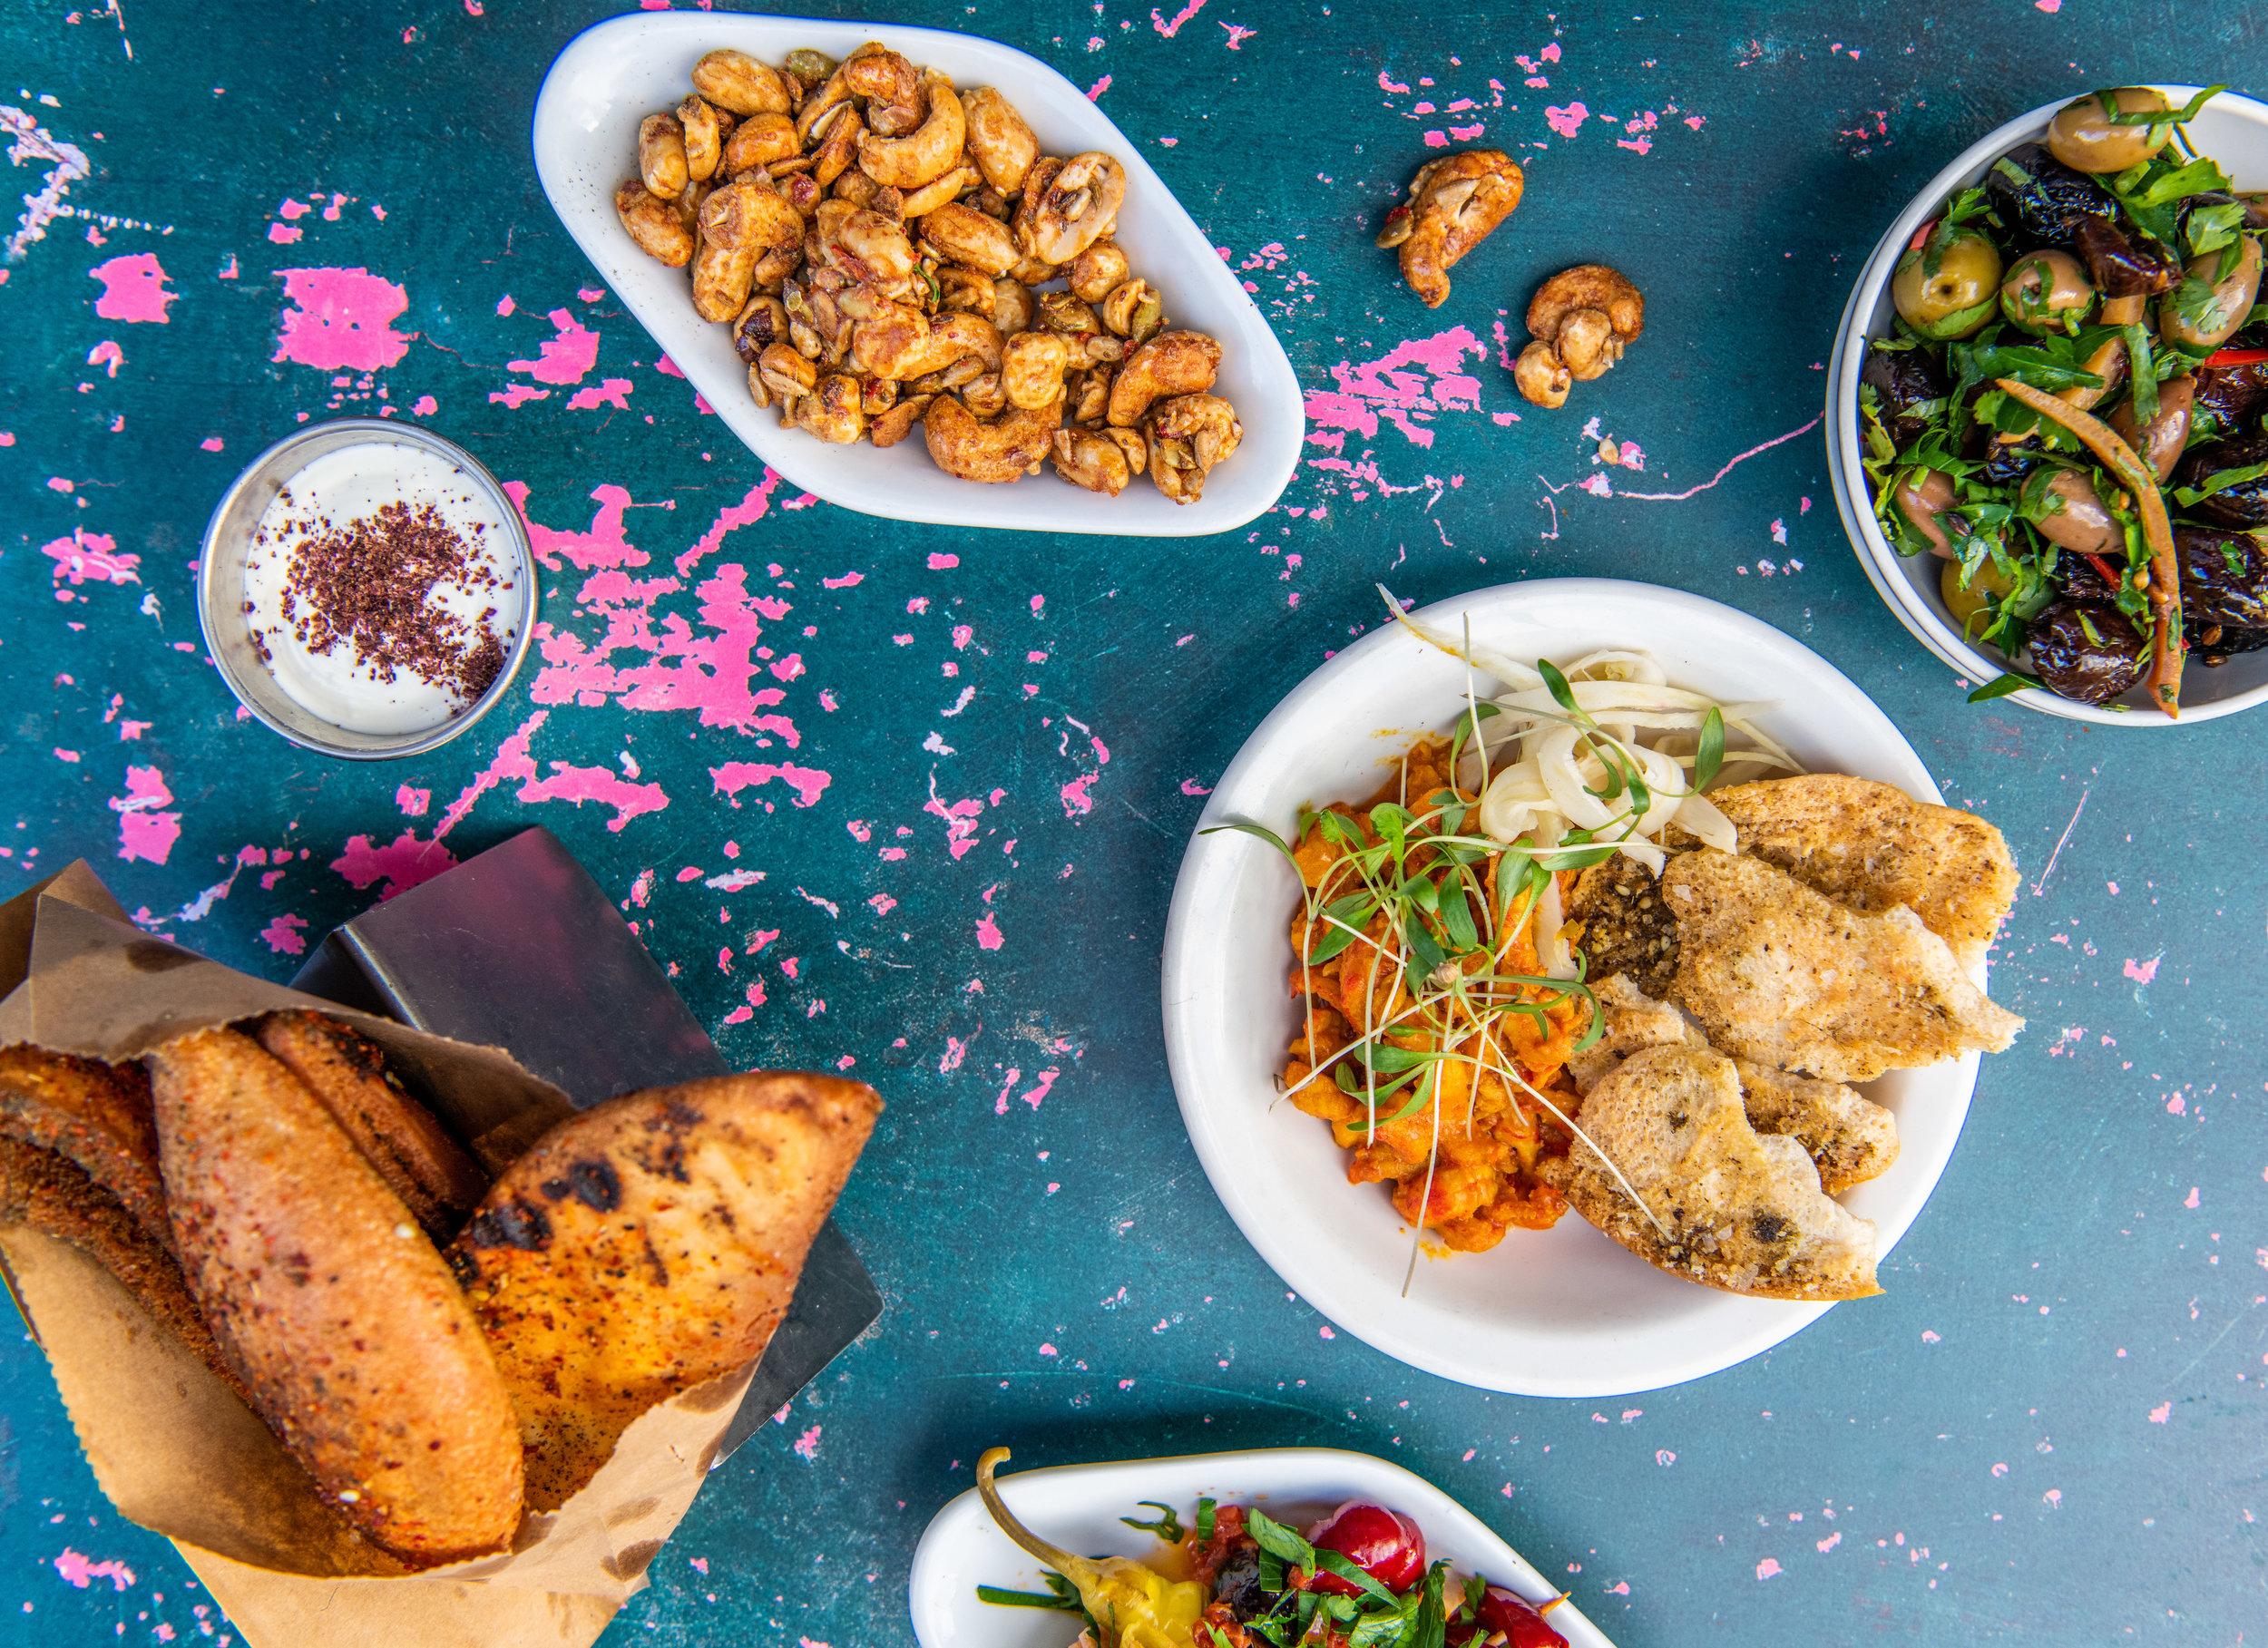 Shawarma Bar by Berber & Q -